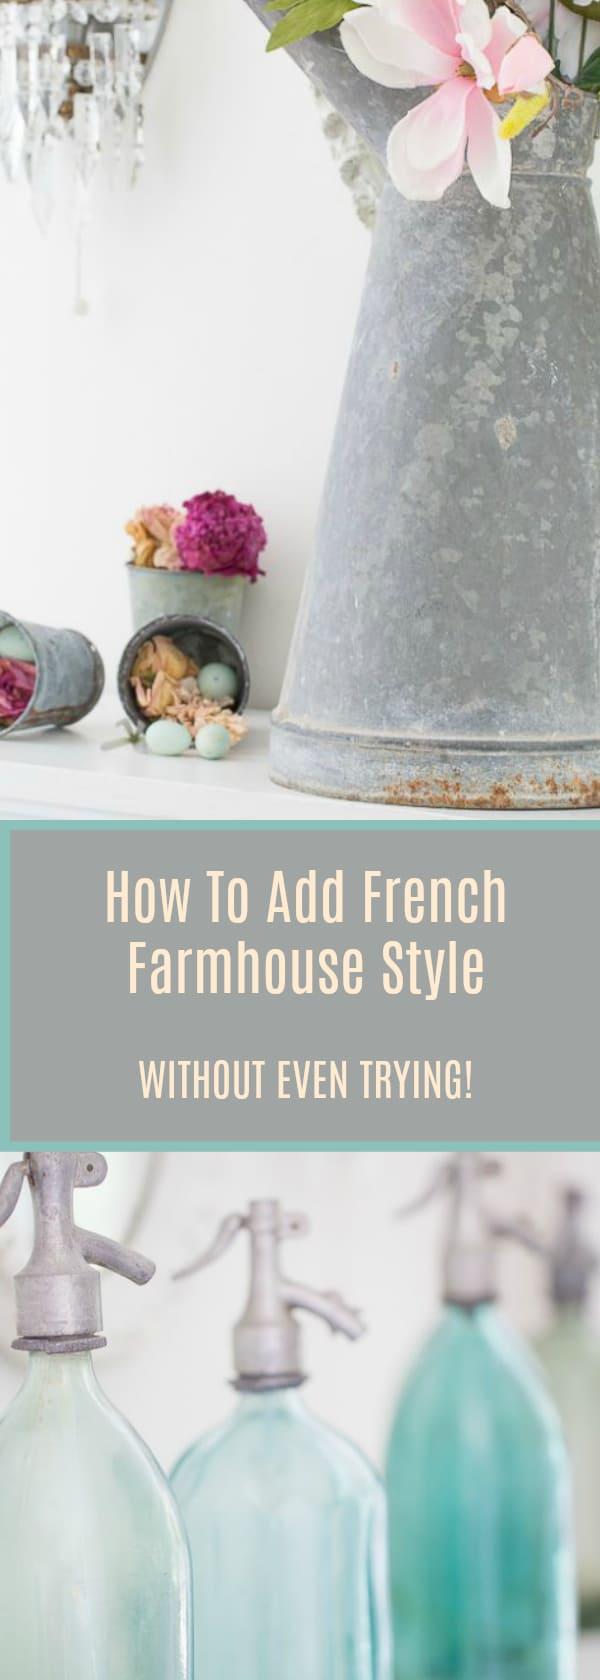 french farmhouse style